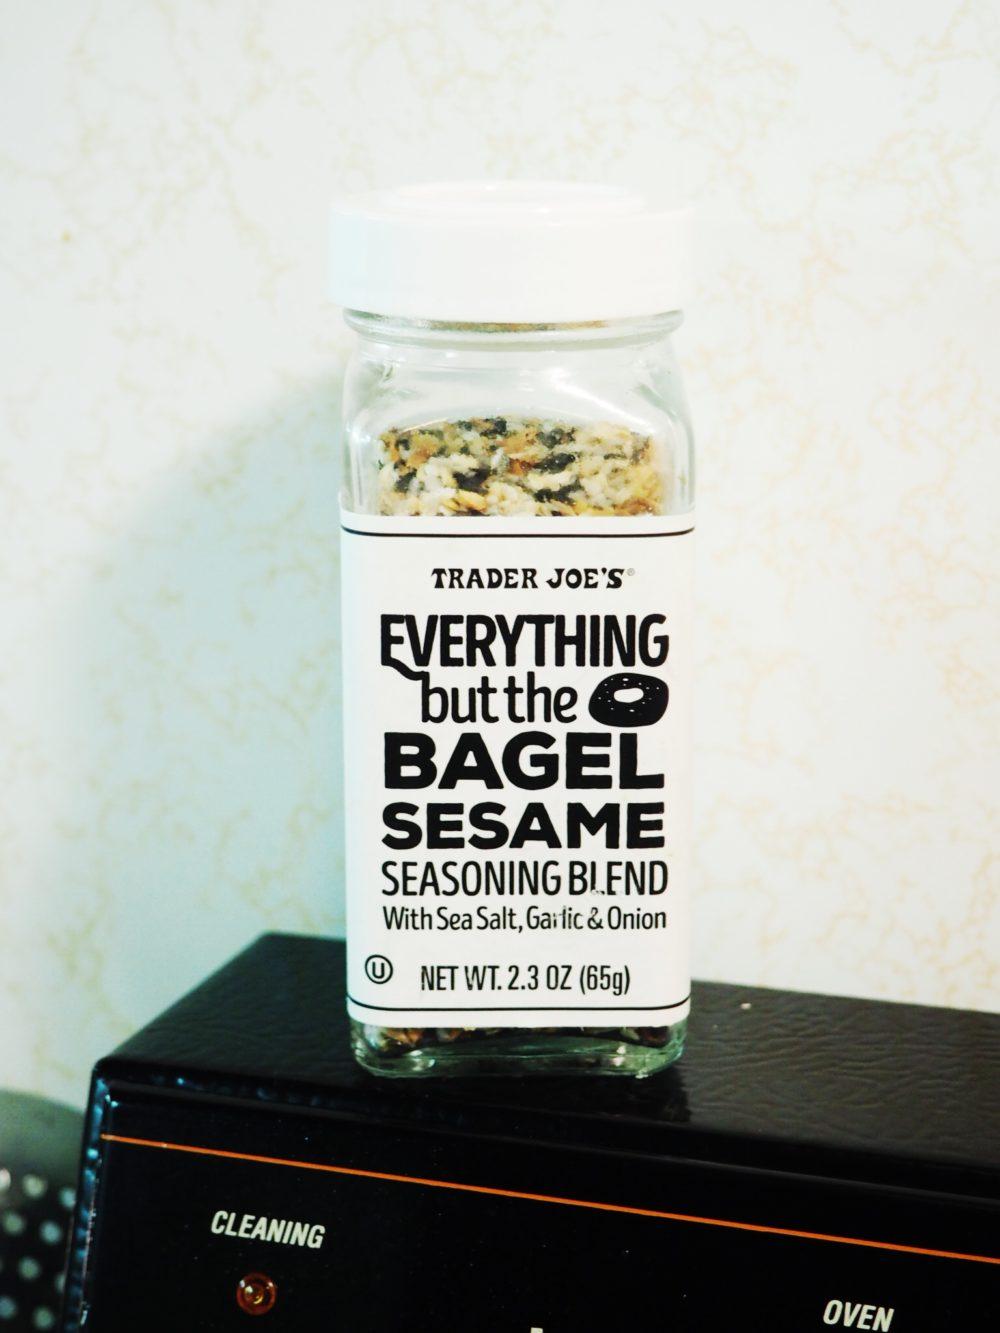 My Favorite Ways to Eat Everything But The Bagle Seasoning…